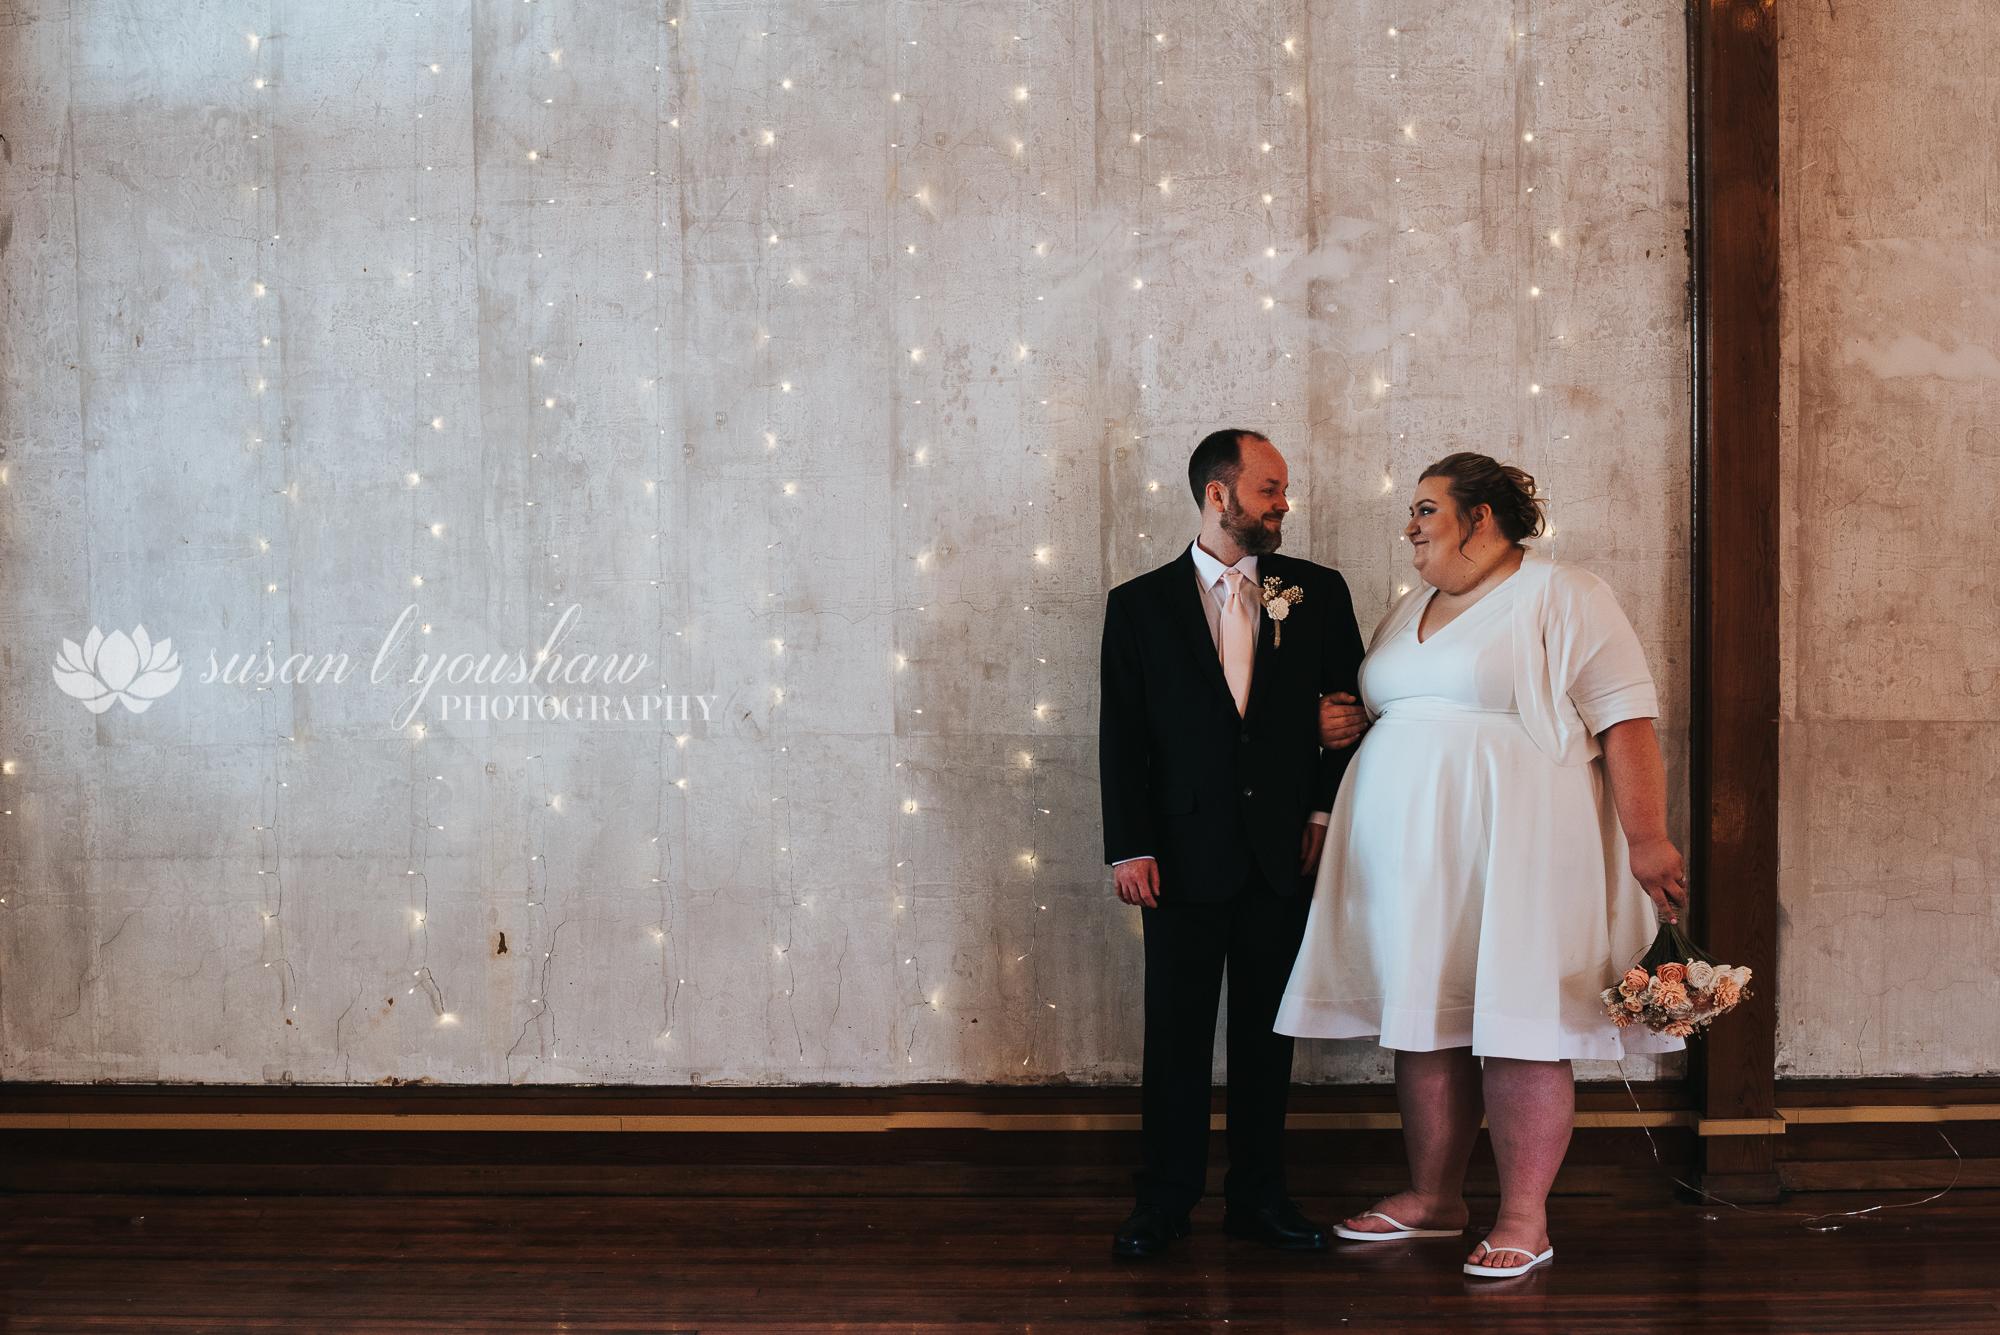 Bill and Sarah Wedding Photos 06-08-2019 SLY Photography -11.jpg